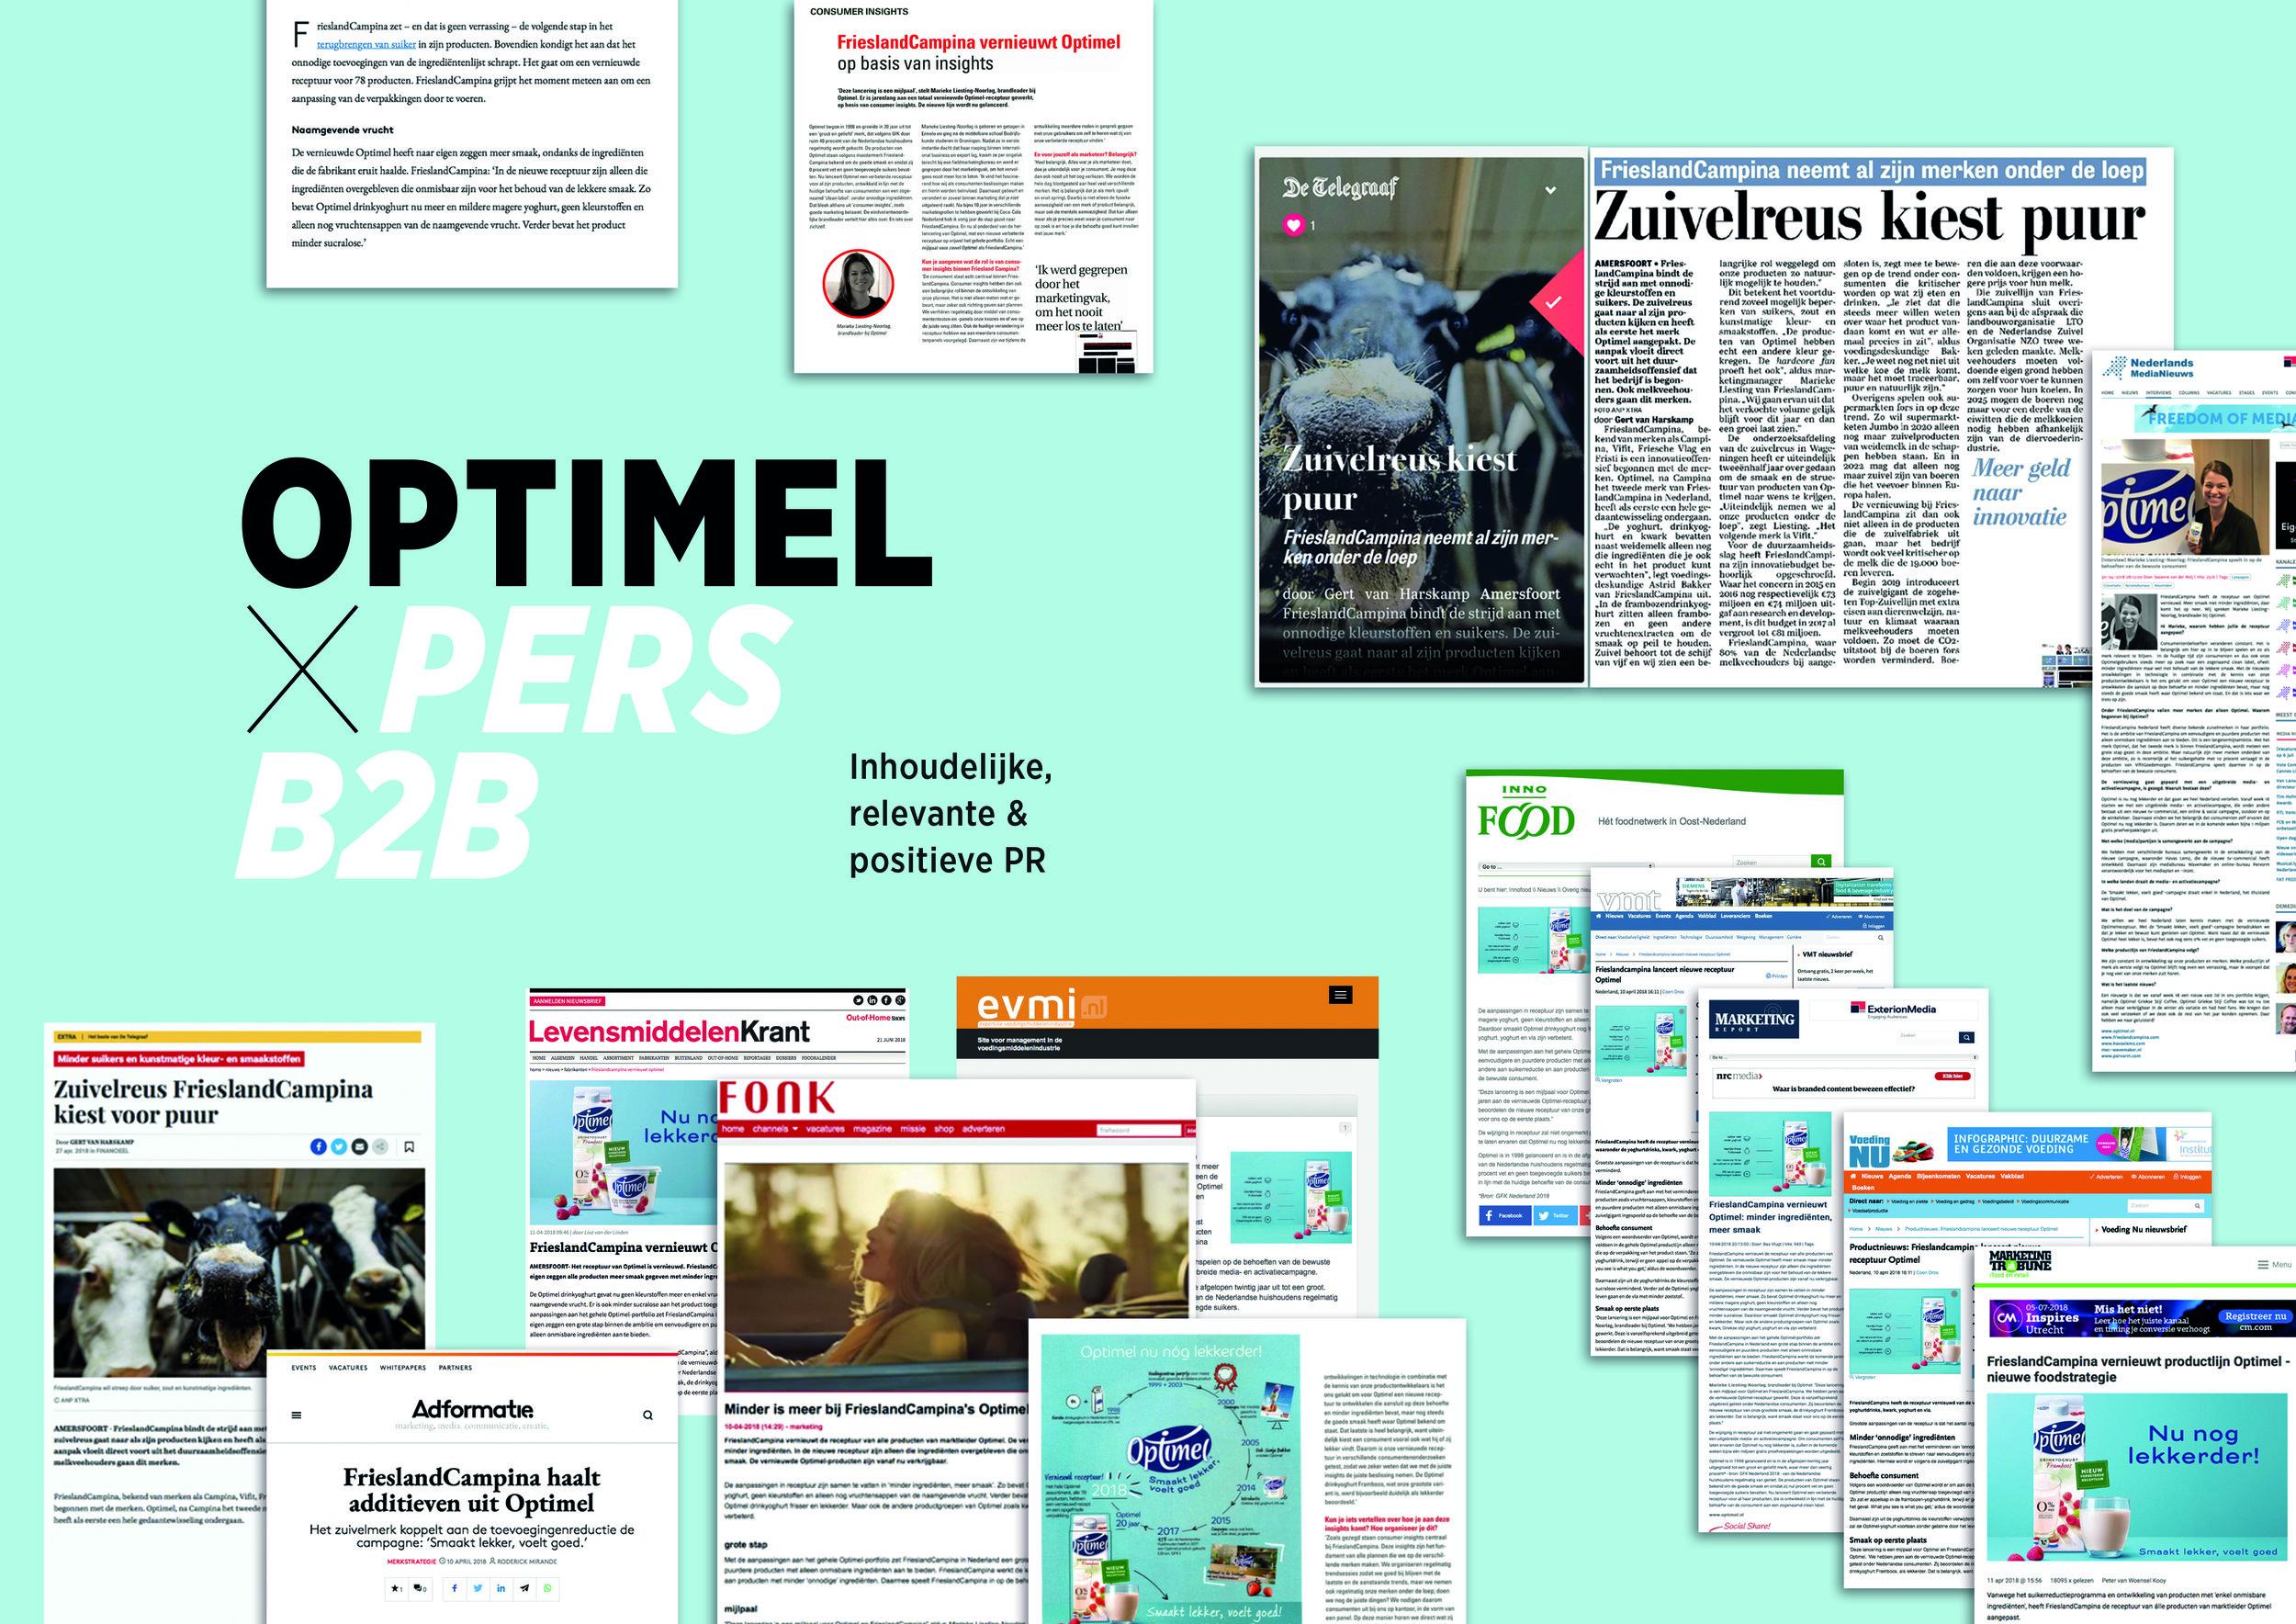 Optimel_ADCN_05.jpg